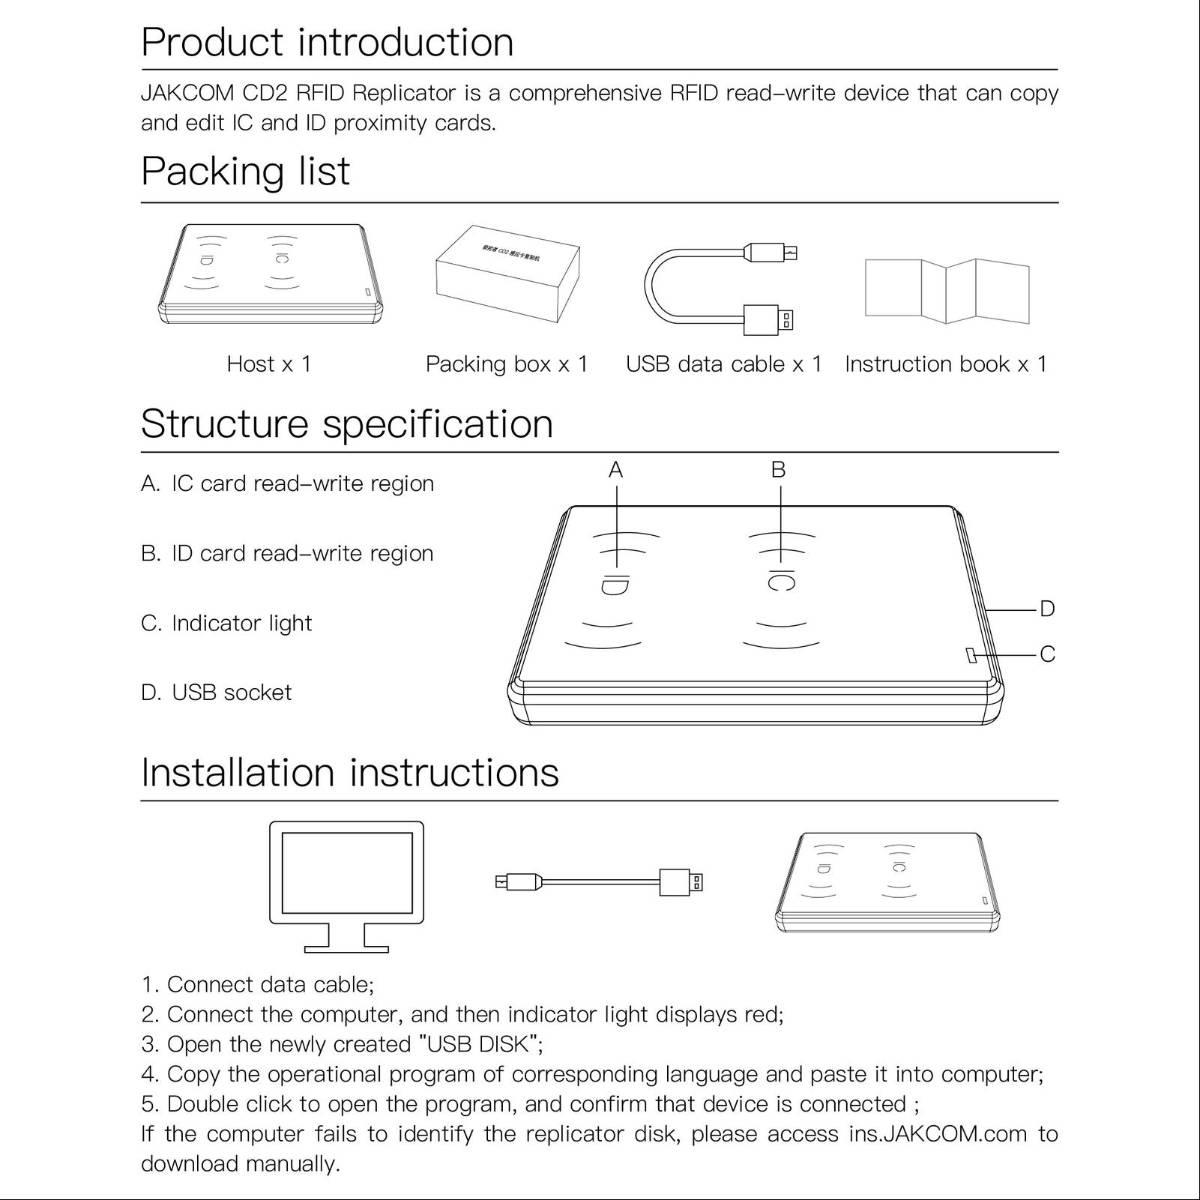 JAKCOM CD2 RFID NFC Replicator Access Card ID IC Duplicator 2 in 11